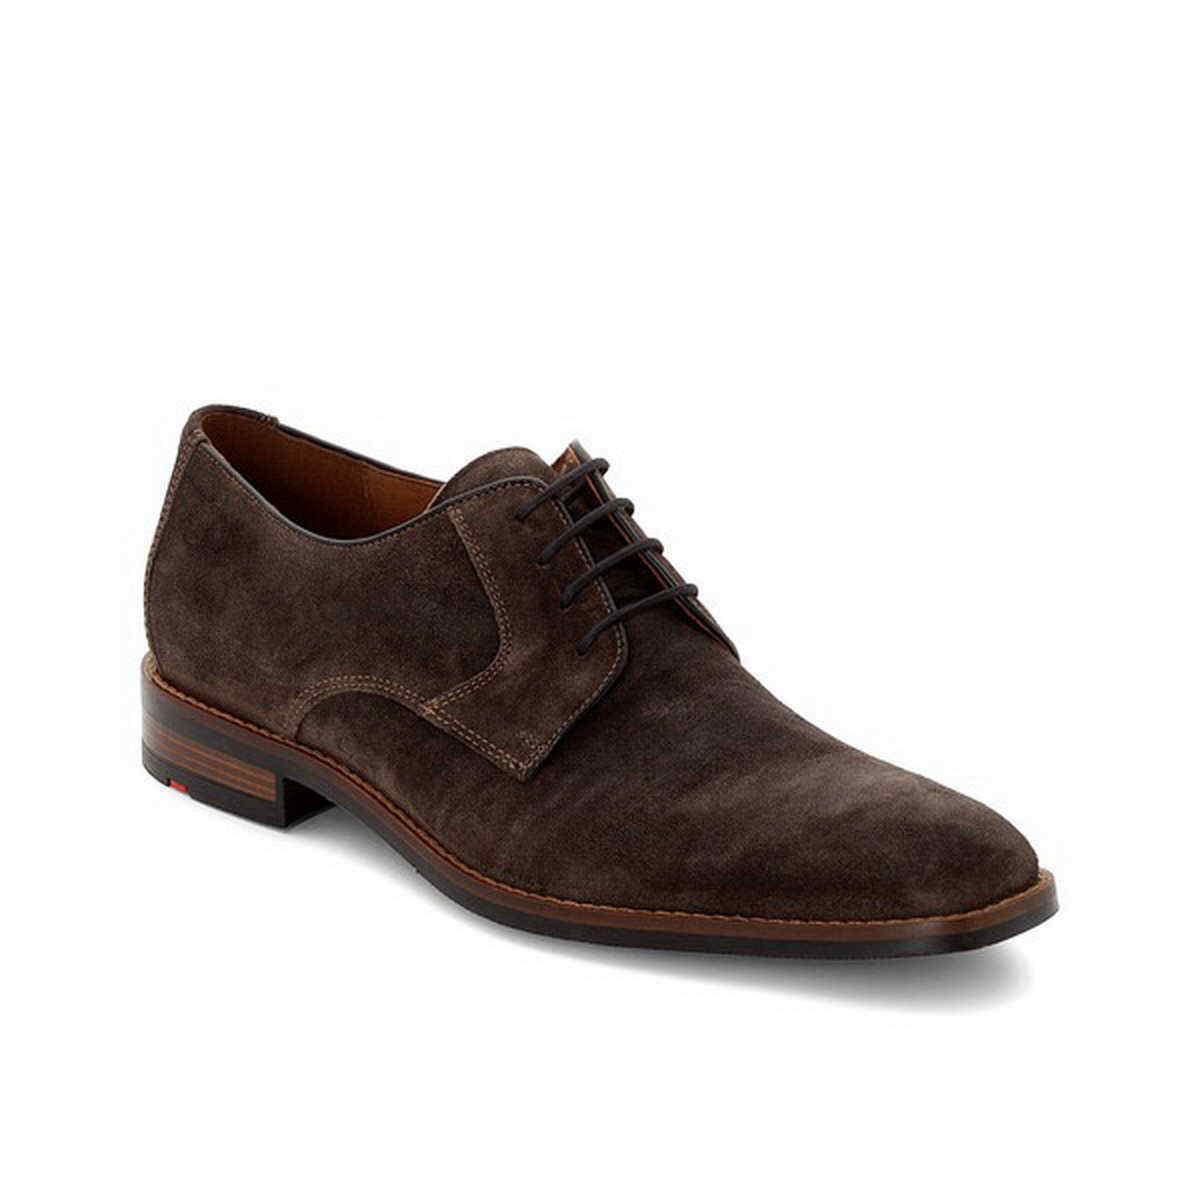 Lloyd Business Stuart Dove gris nobuck cuero suela de caucho con cordones zapato 28-633-41